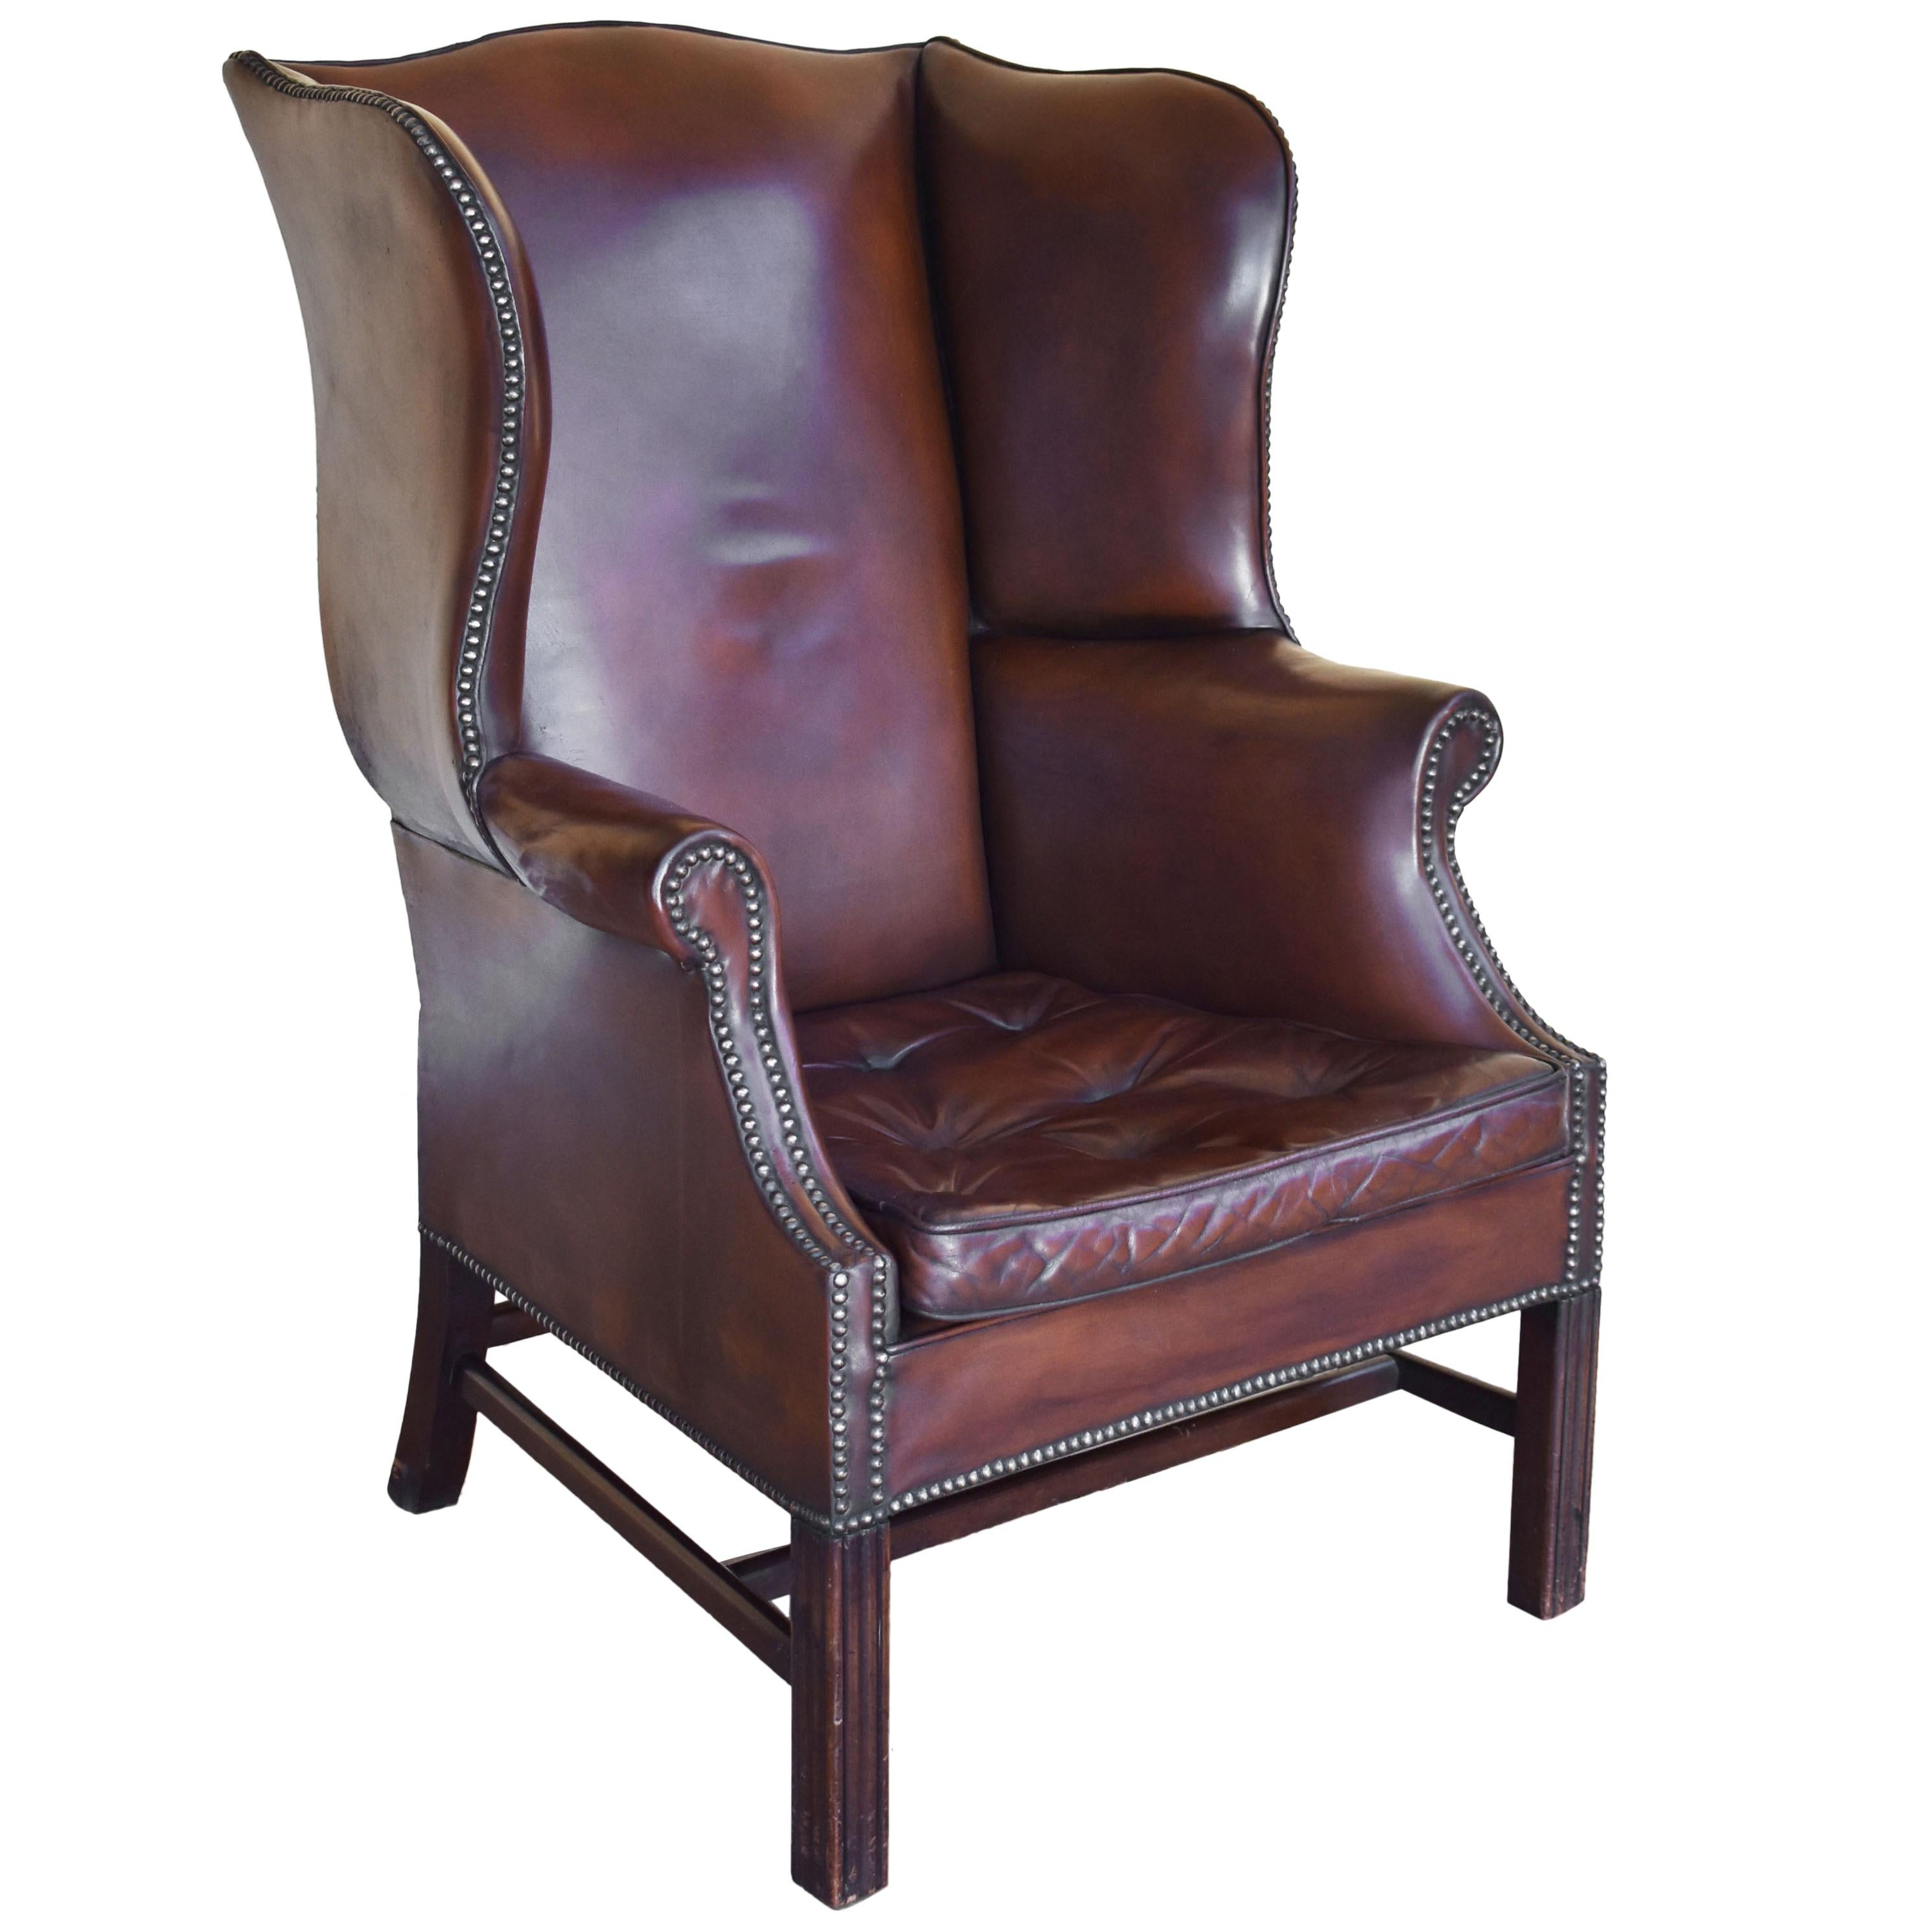 20th Century English Georgian Style Leather Wingback Armchair